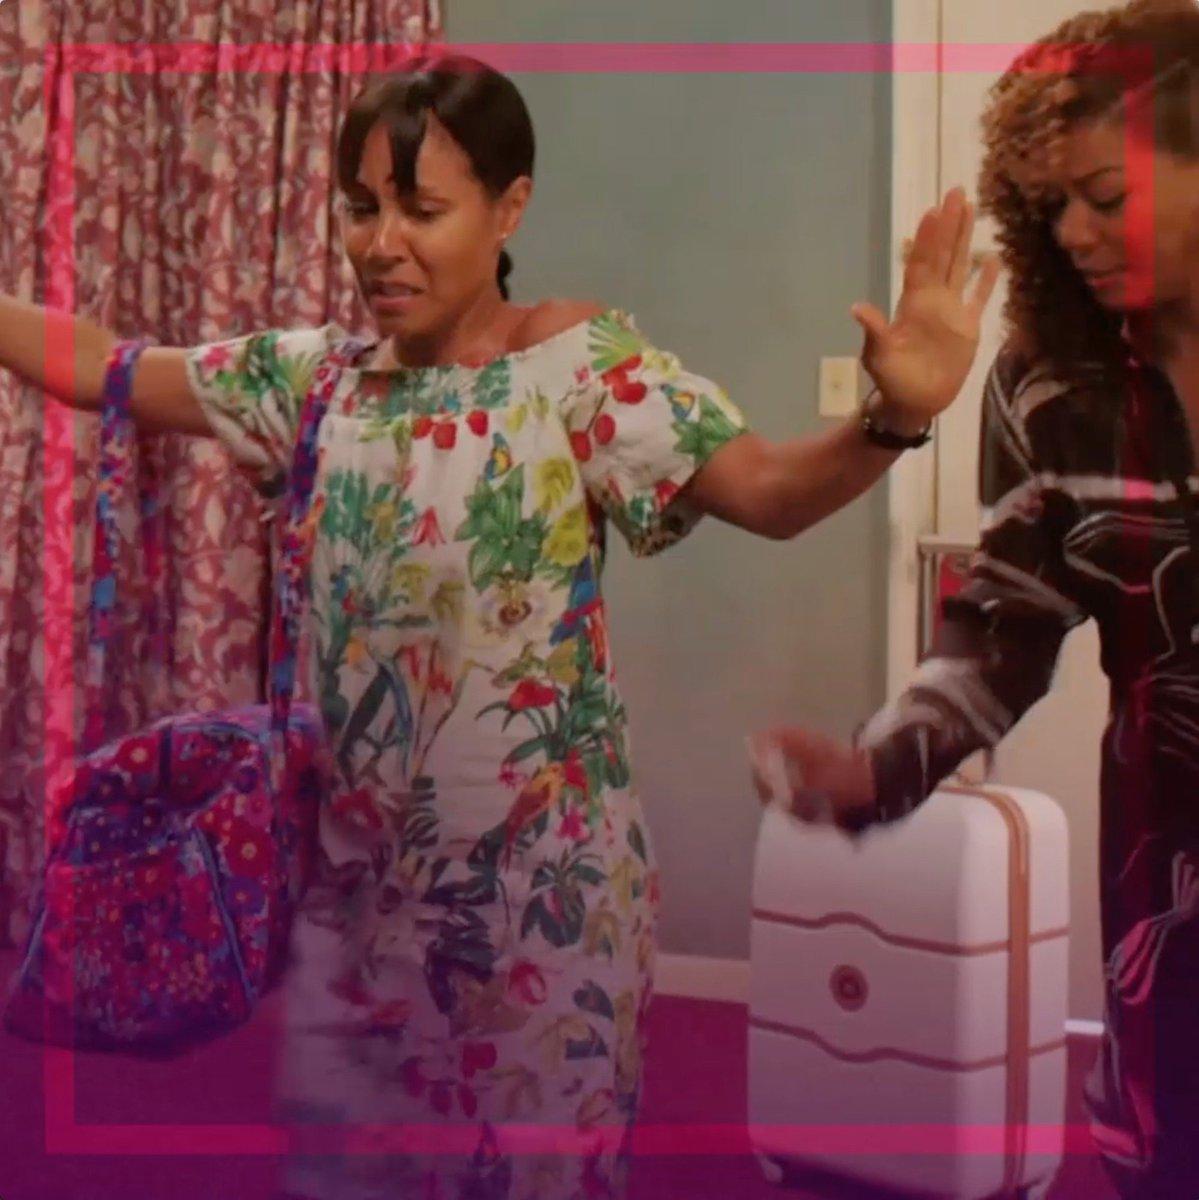 .@GirlsTripMovie out today on DVD & Blu-ray.  Treat yourself to it! https://t.co/zqOCKe5T5O